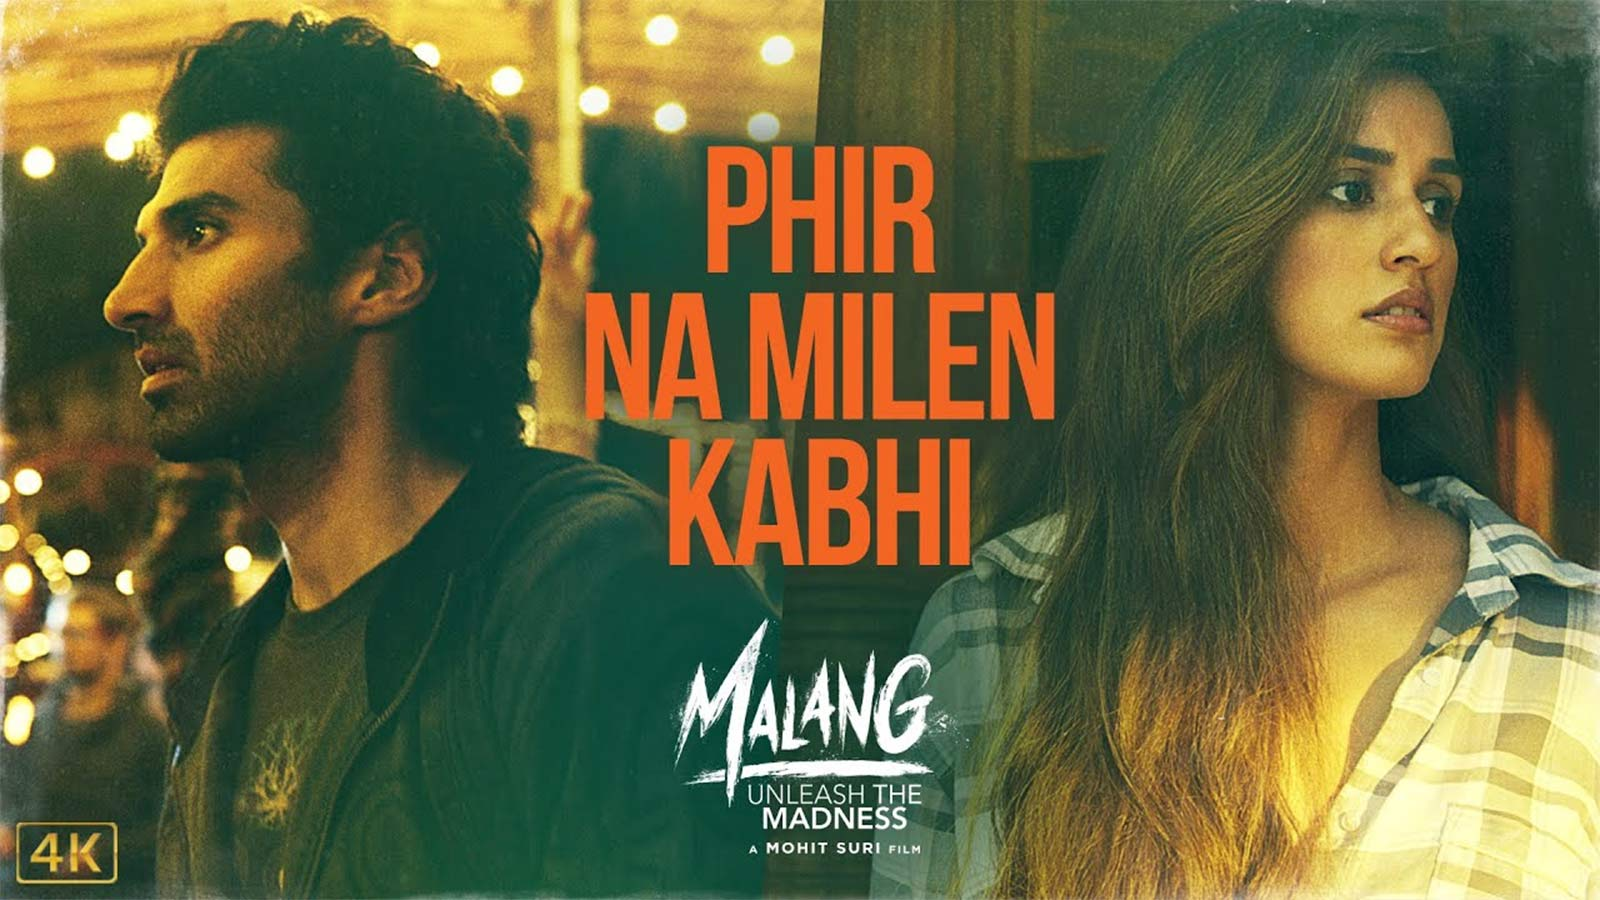 Phir Na Milen Kabhi Malang 2020 Ankit Tiwari Full Mp3 Song Download Free Febborn India S Favorite Online Shopping Mall